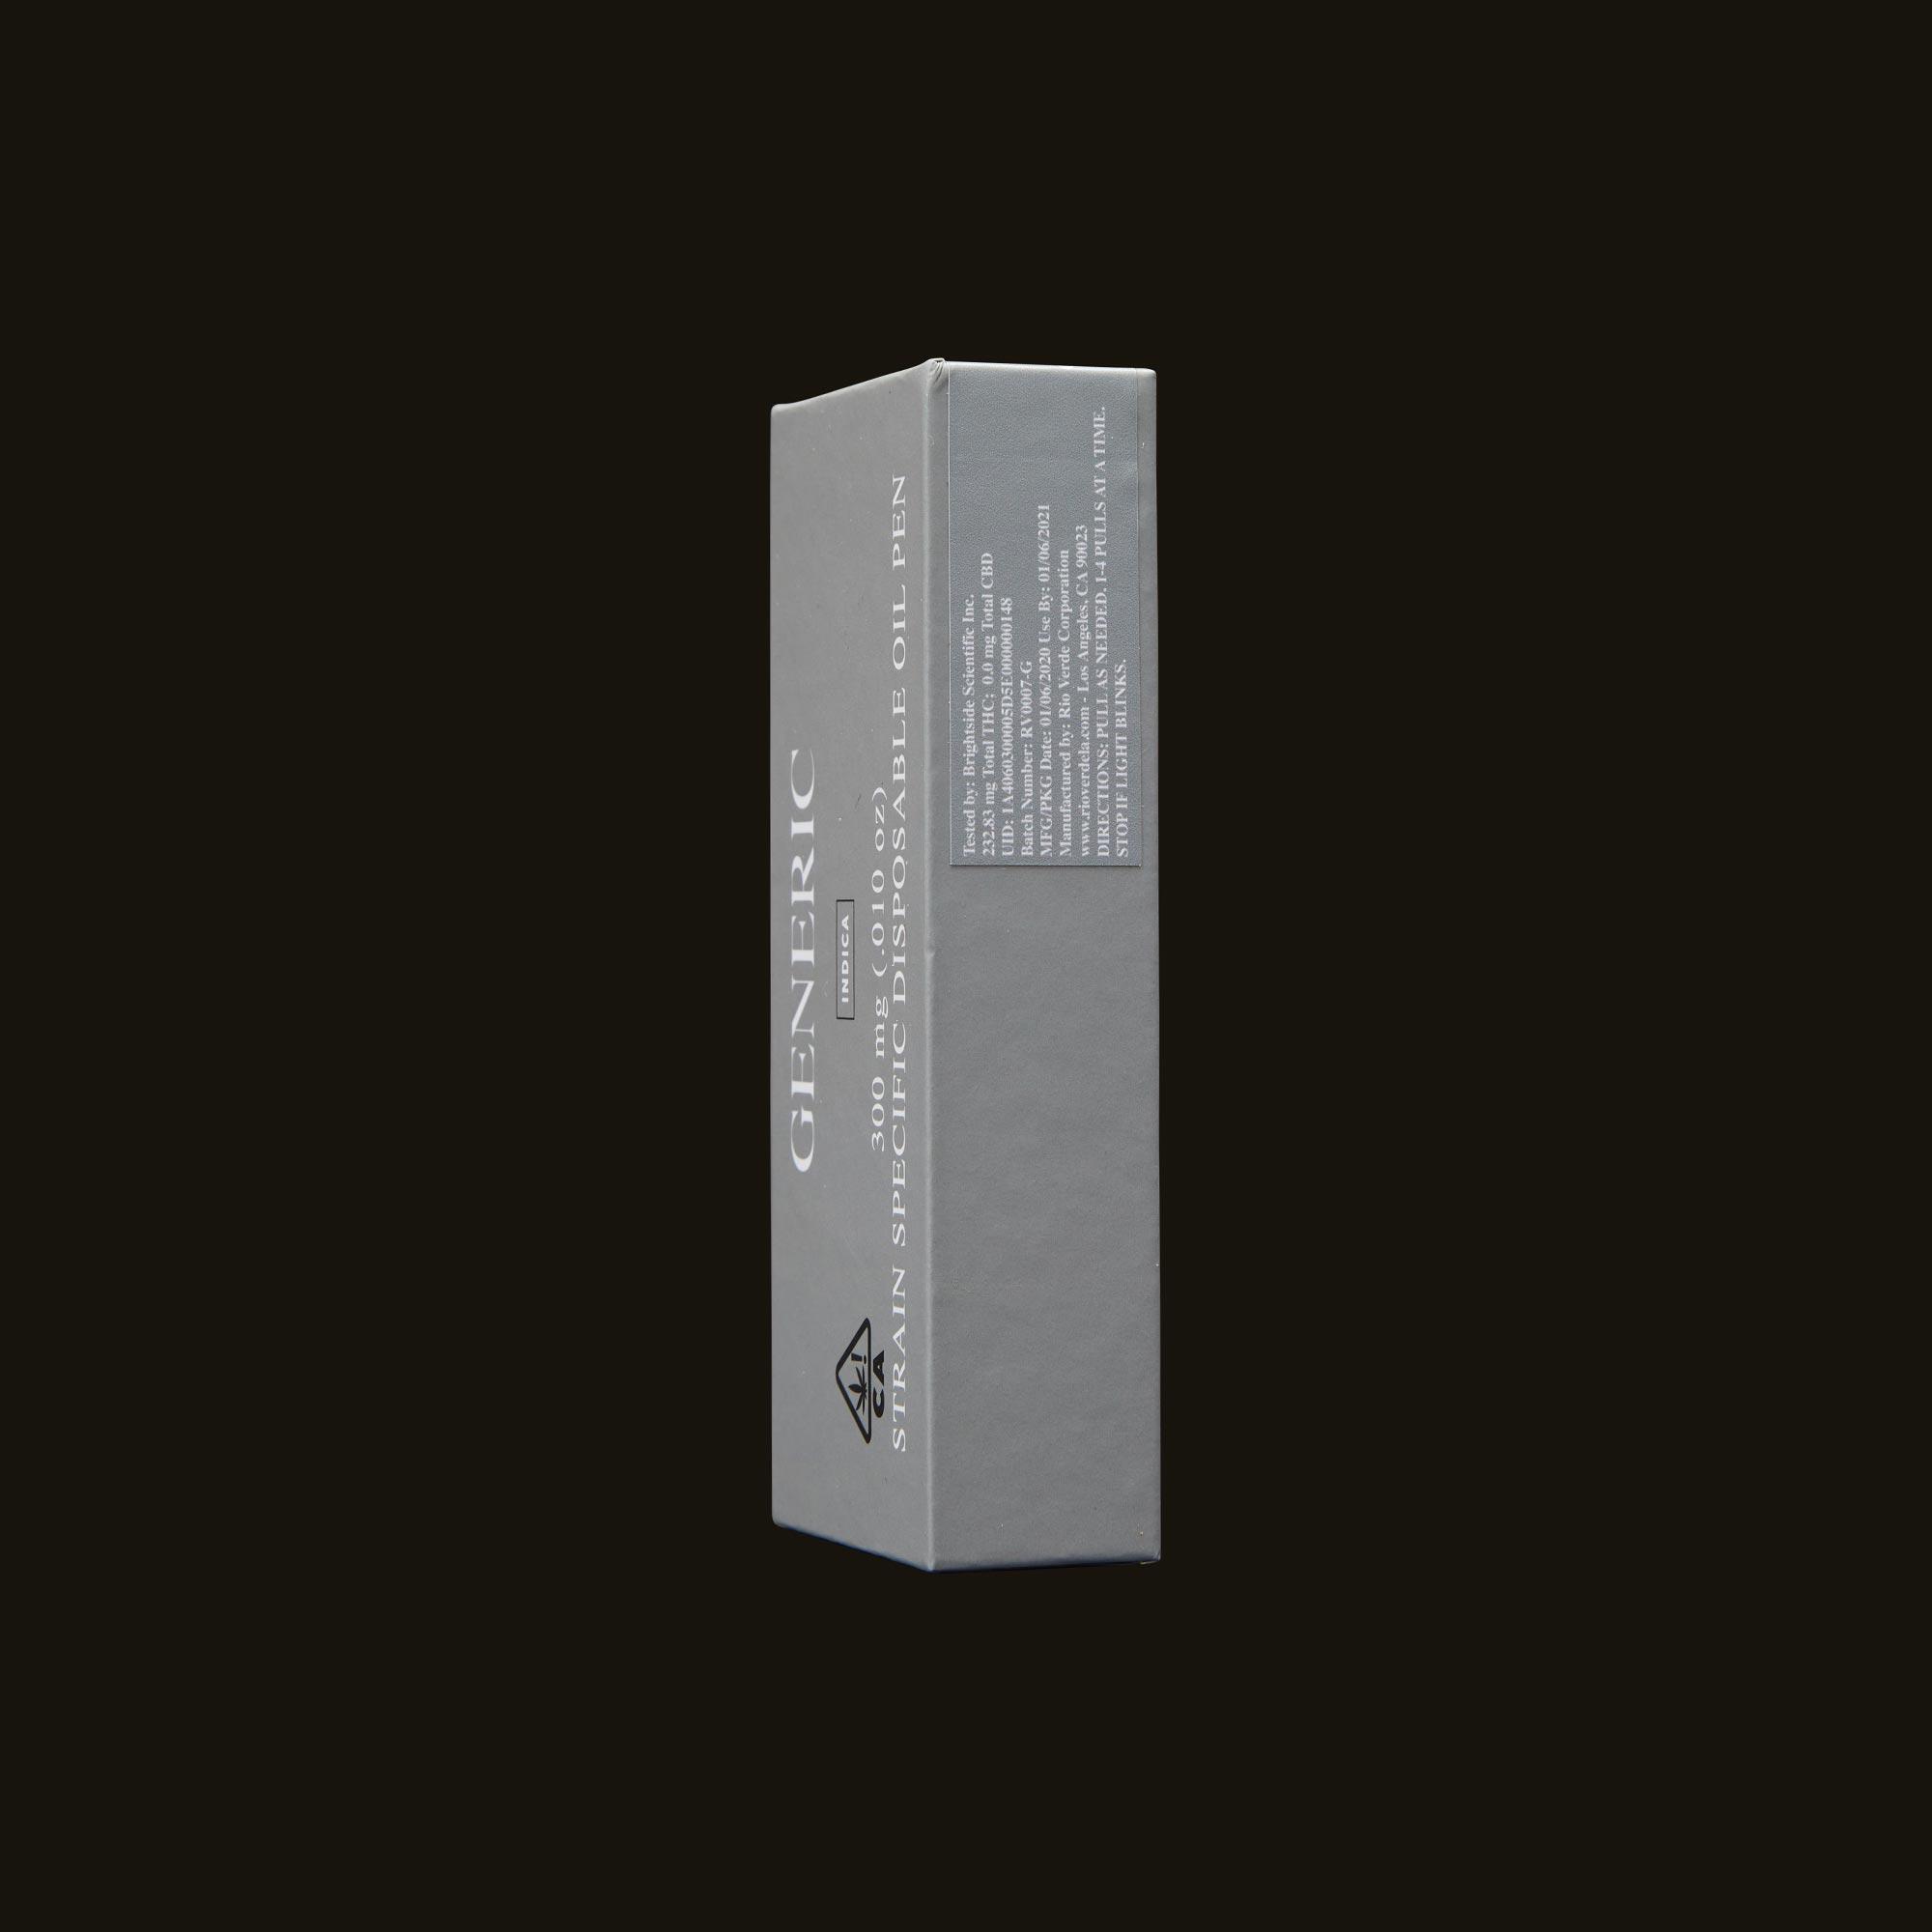 Generic Diamond OG Disposable Side Packaging